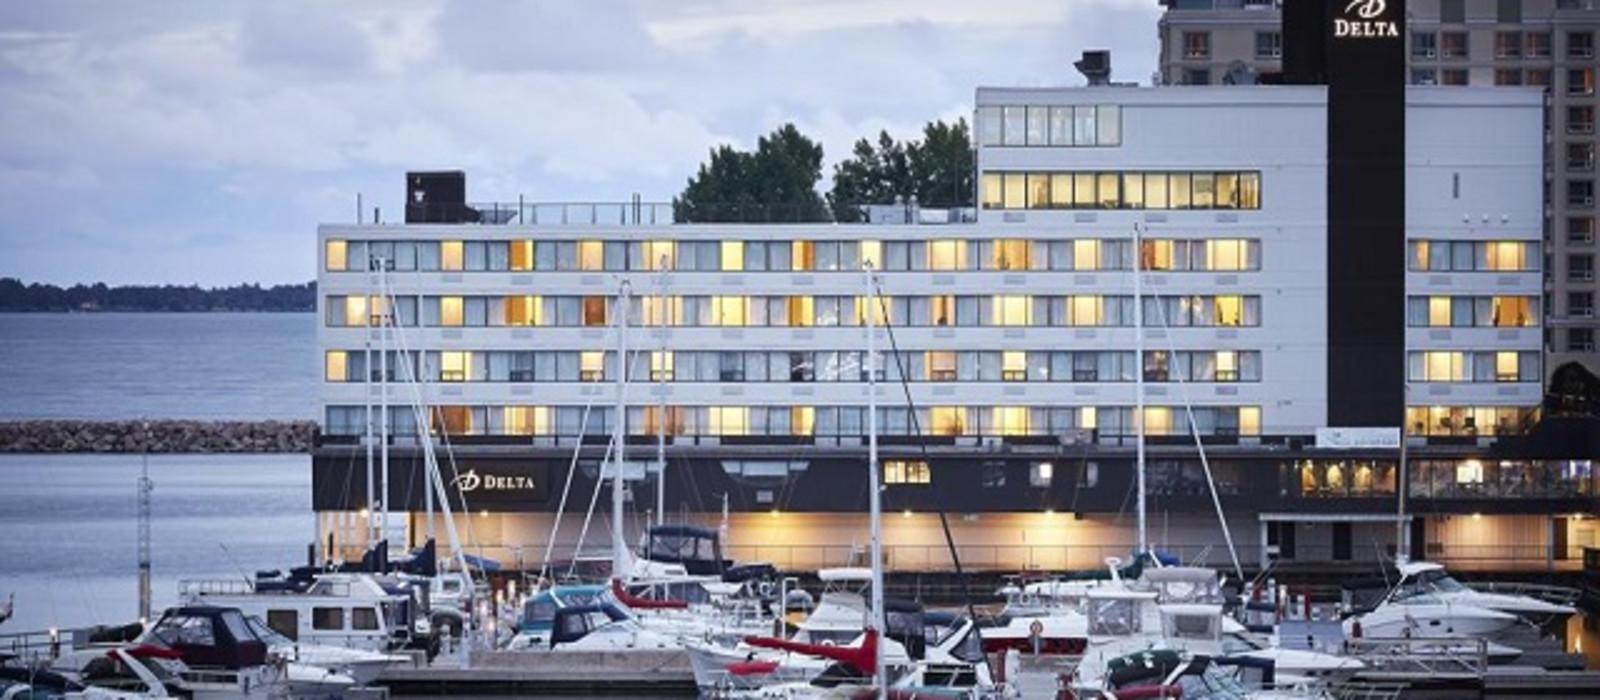 Hotel Delta Kingston Waterfront Canada